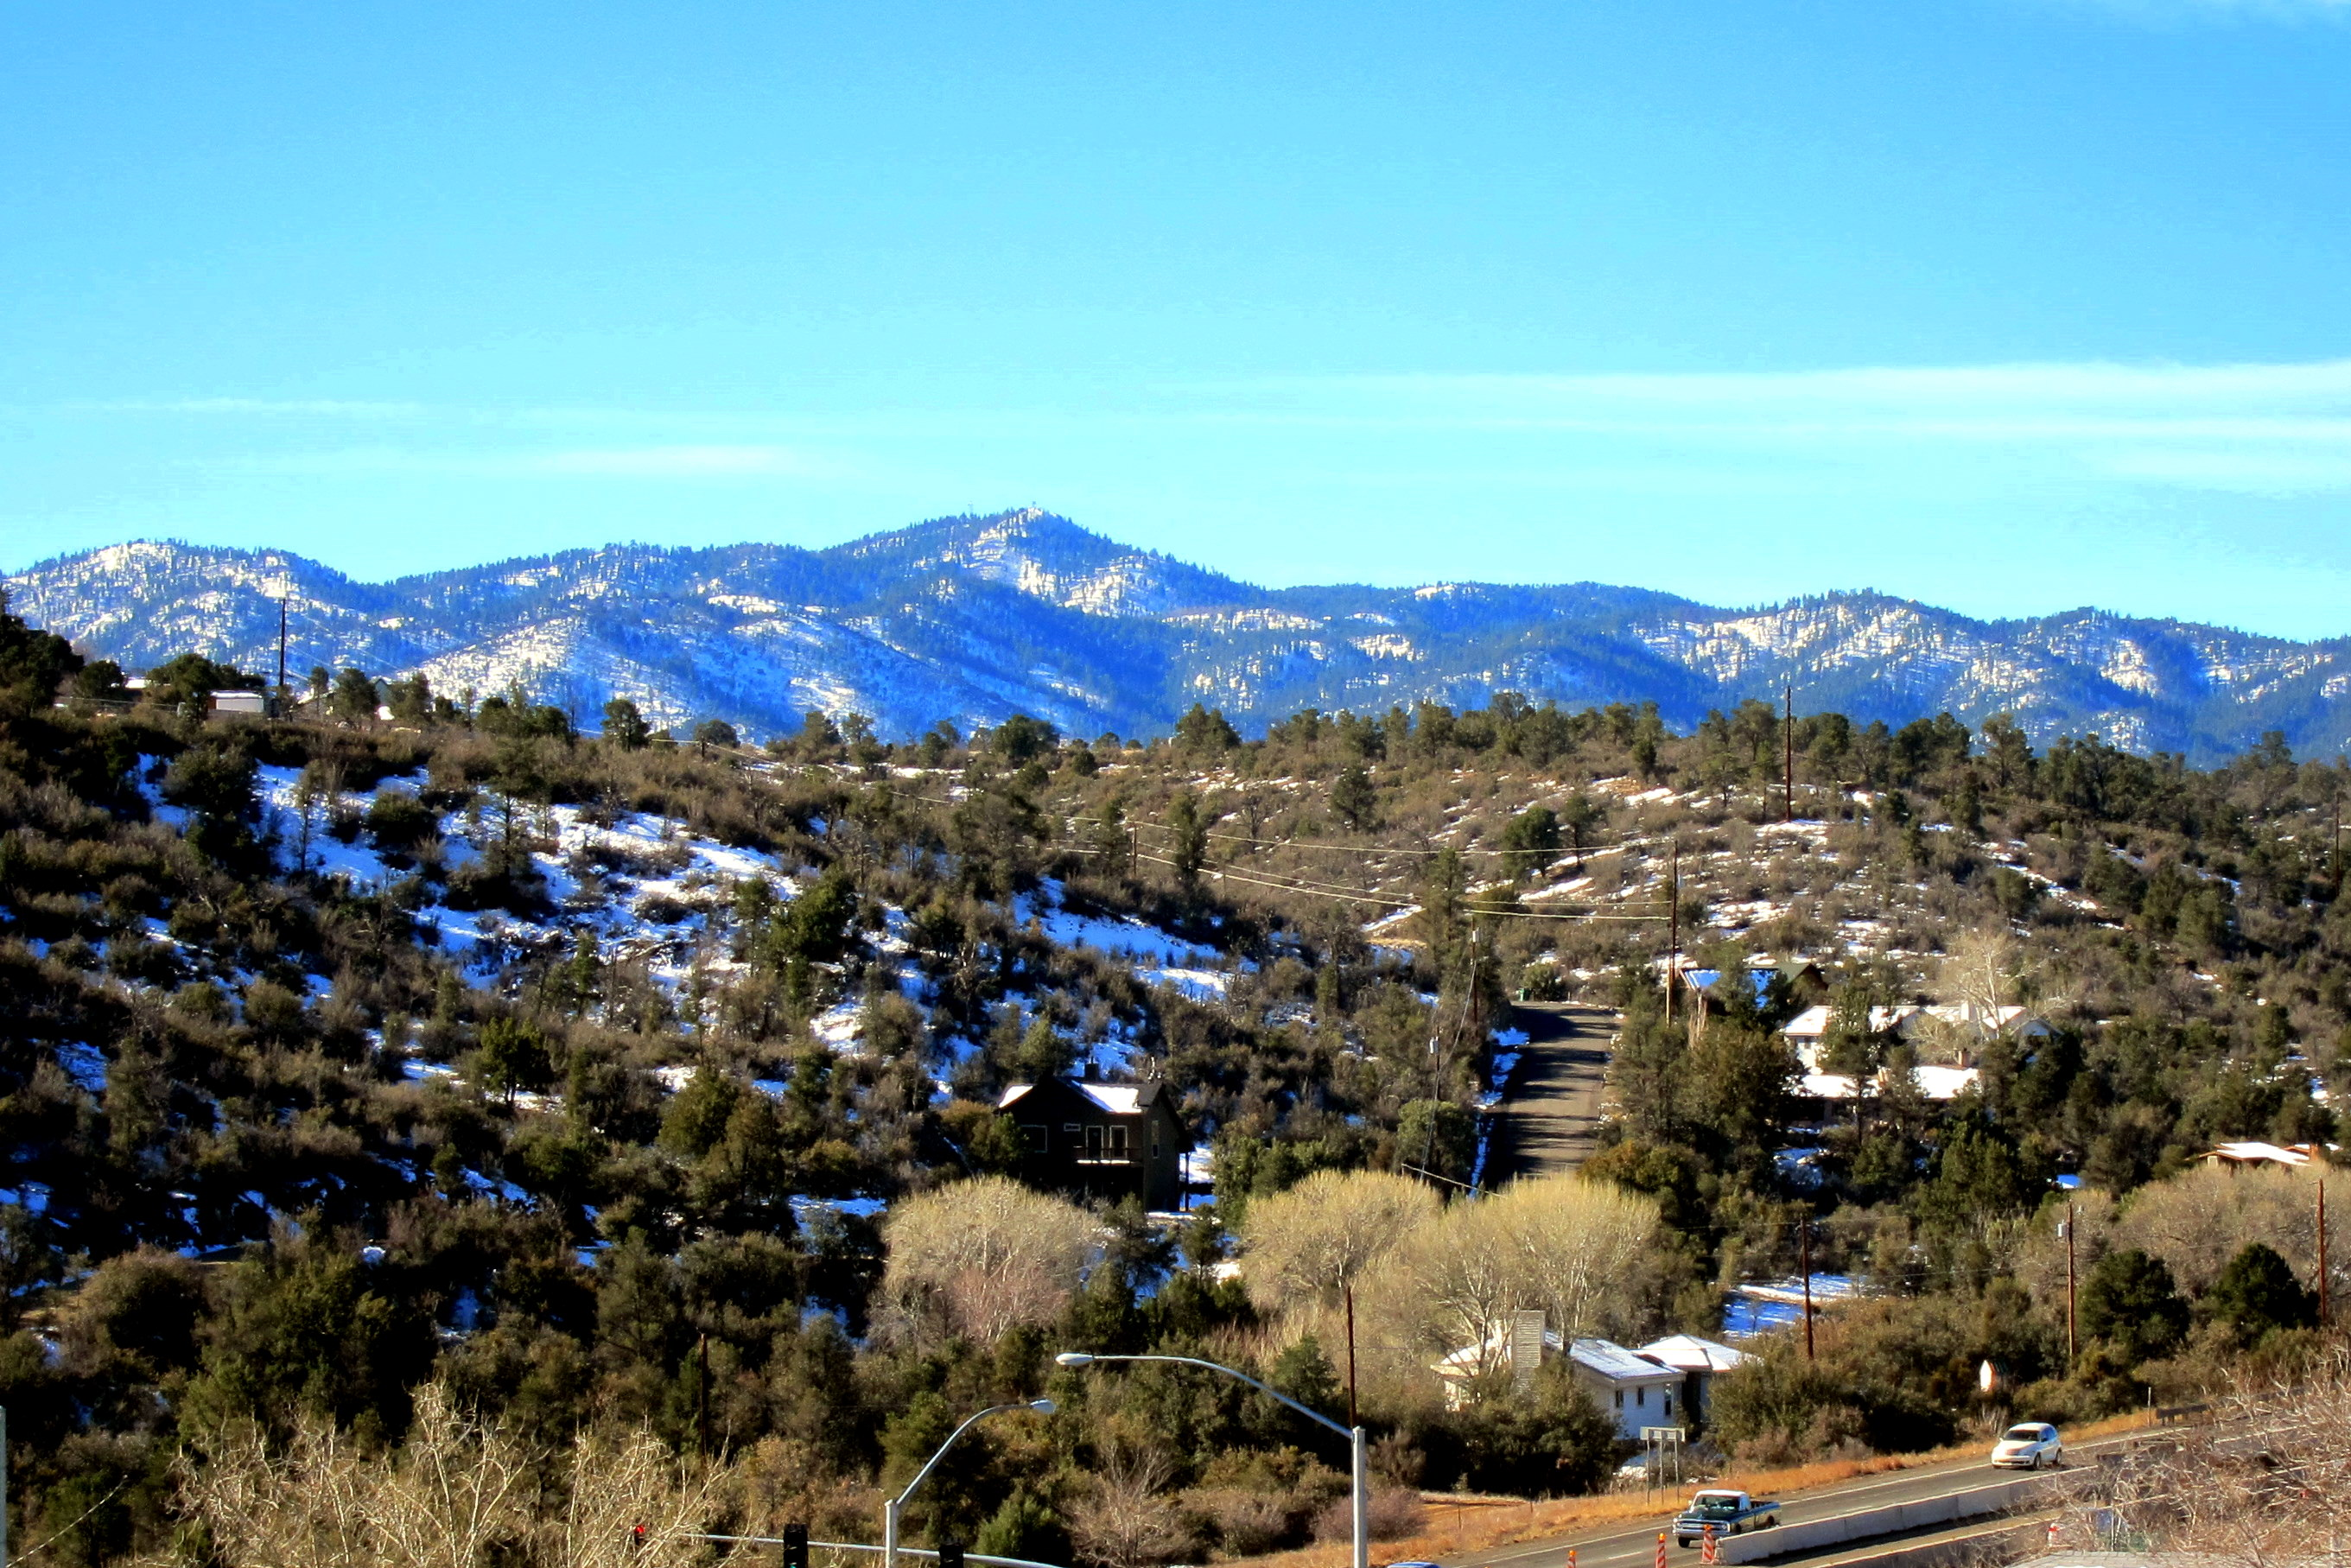 prescott valley Prescott valley tourism: tripadvisor has 4,413 reviews of prescott valley hotels, attractions, and restaurants making it your best prescott valley resource.